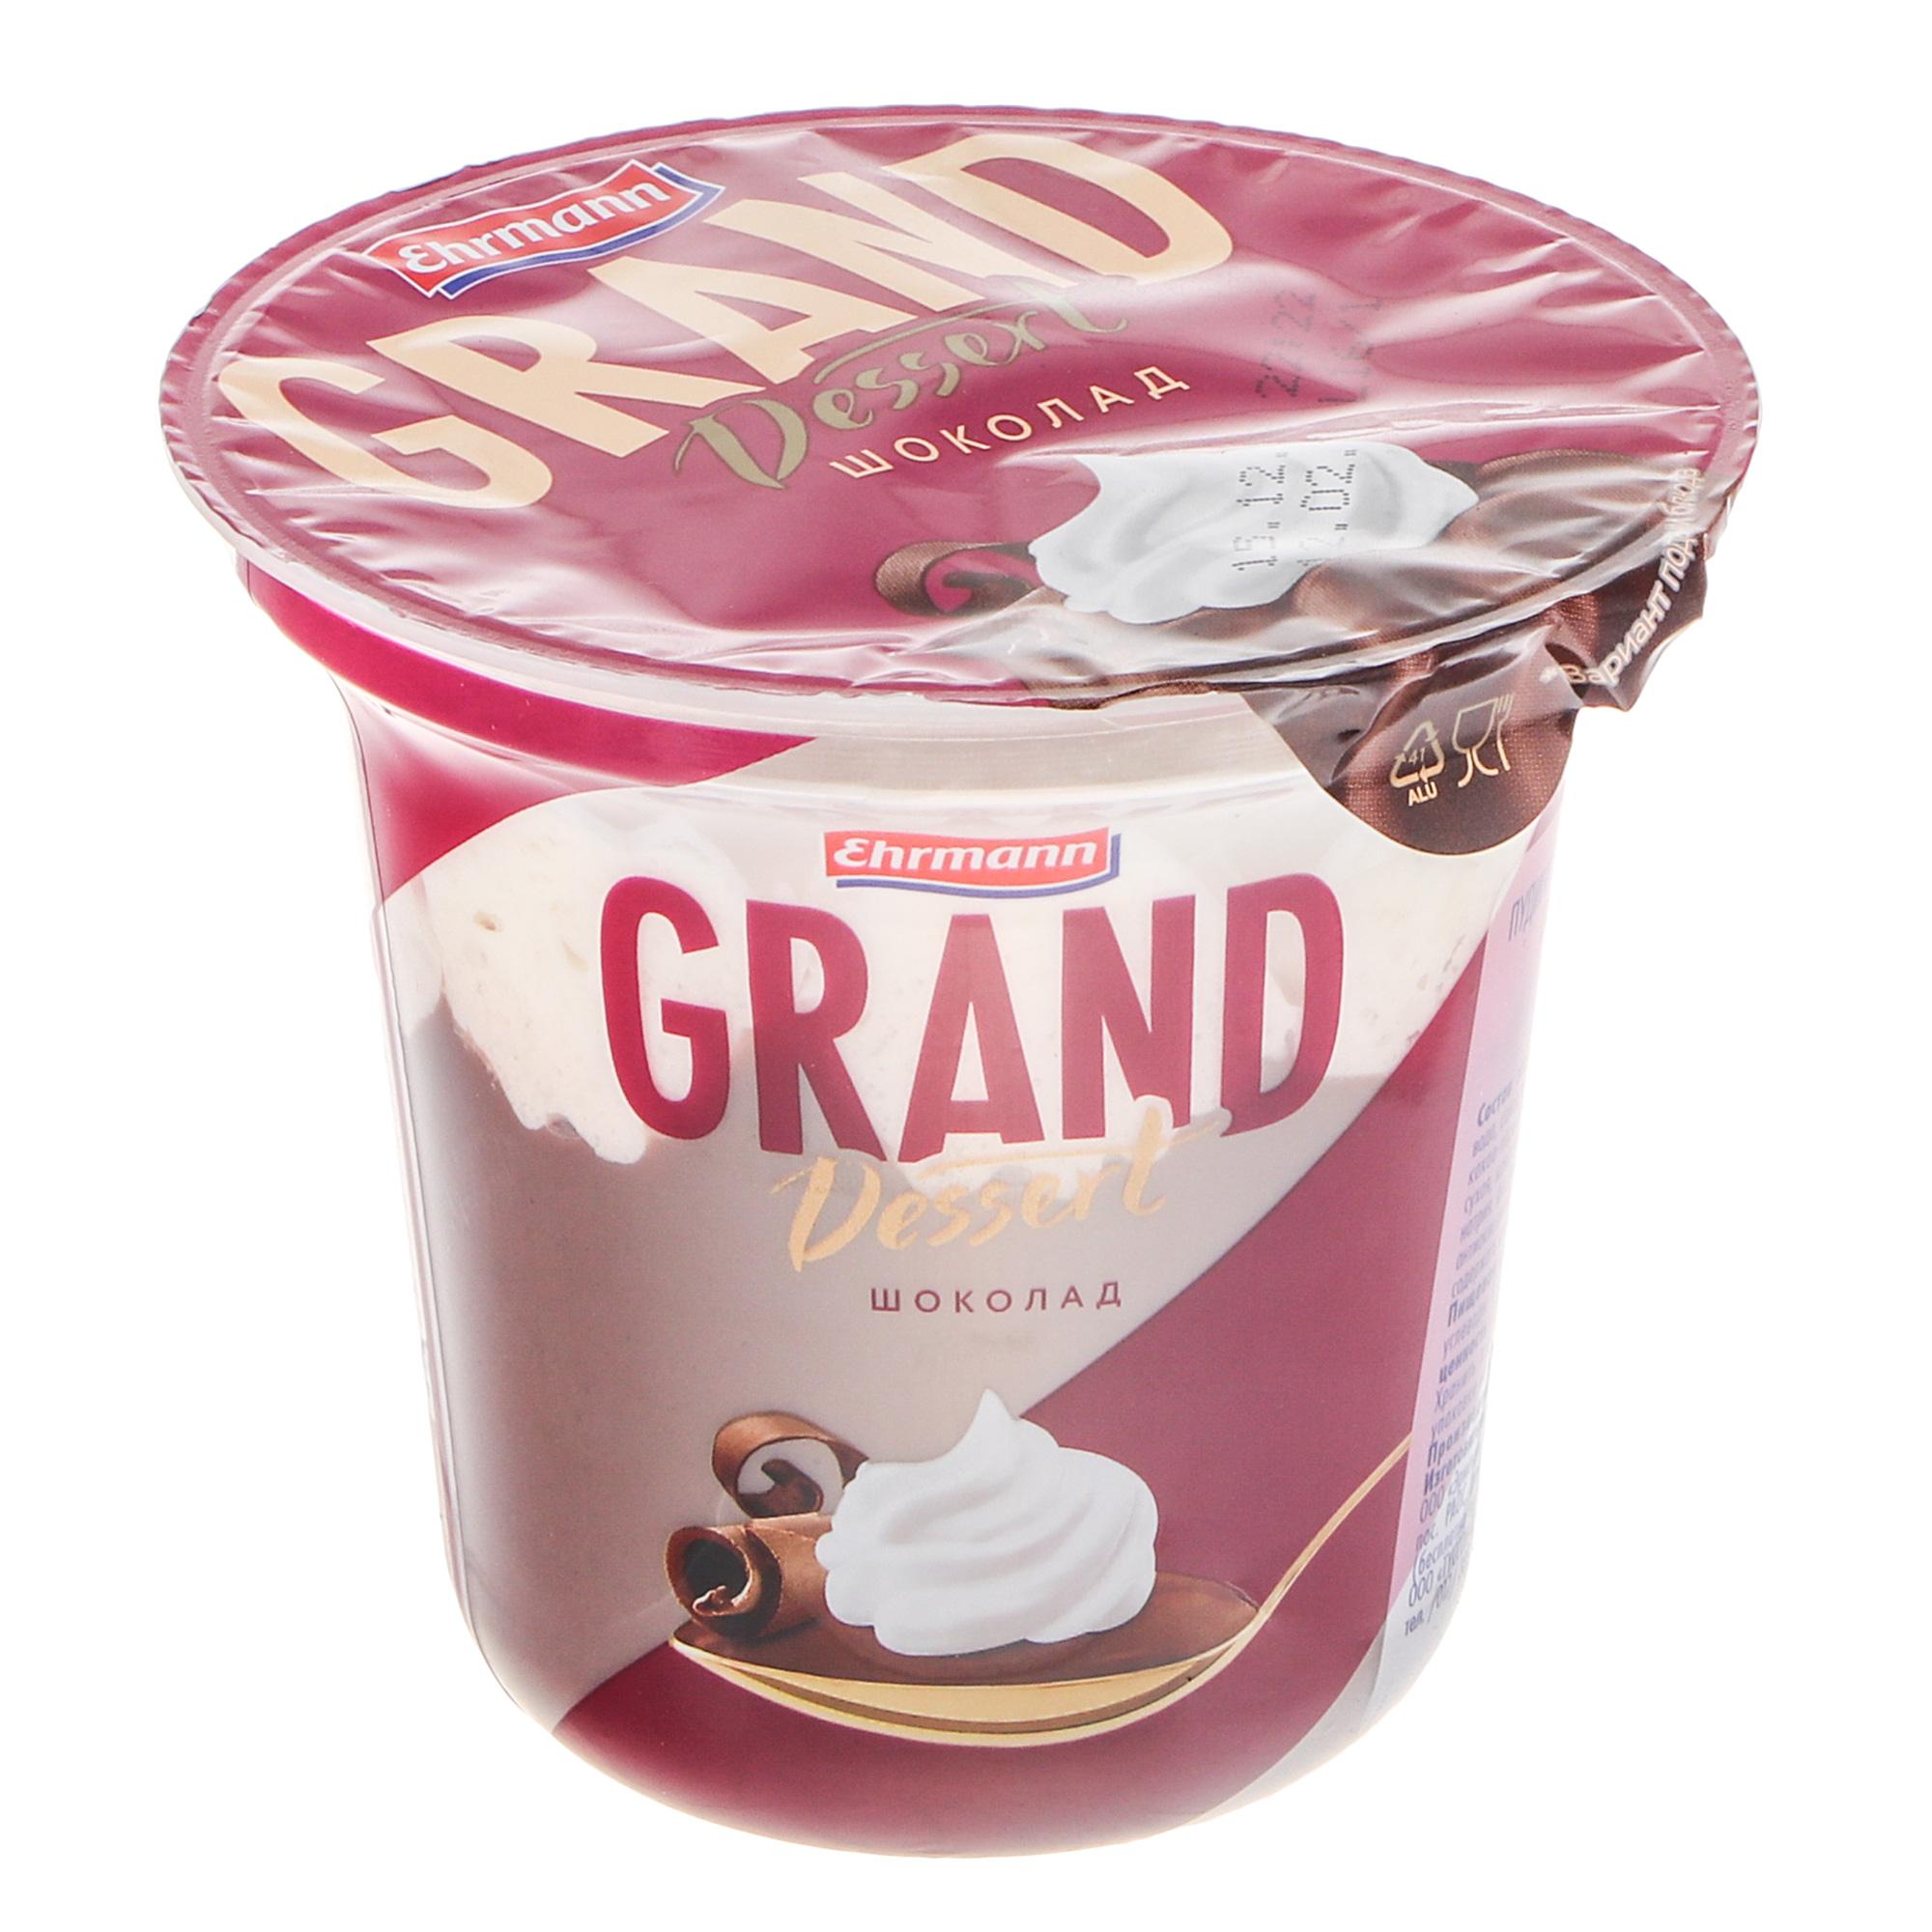 Пудинг Grand Dessert Ehrmann Шоколад со сливочным муссом 4,9% 200 г